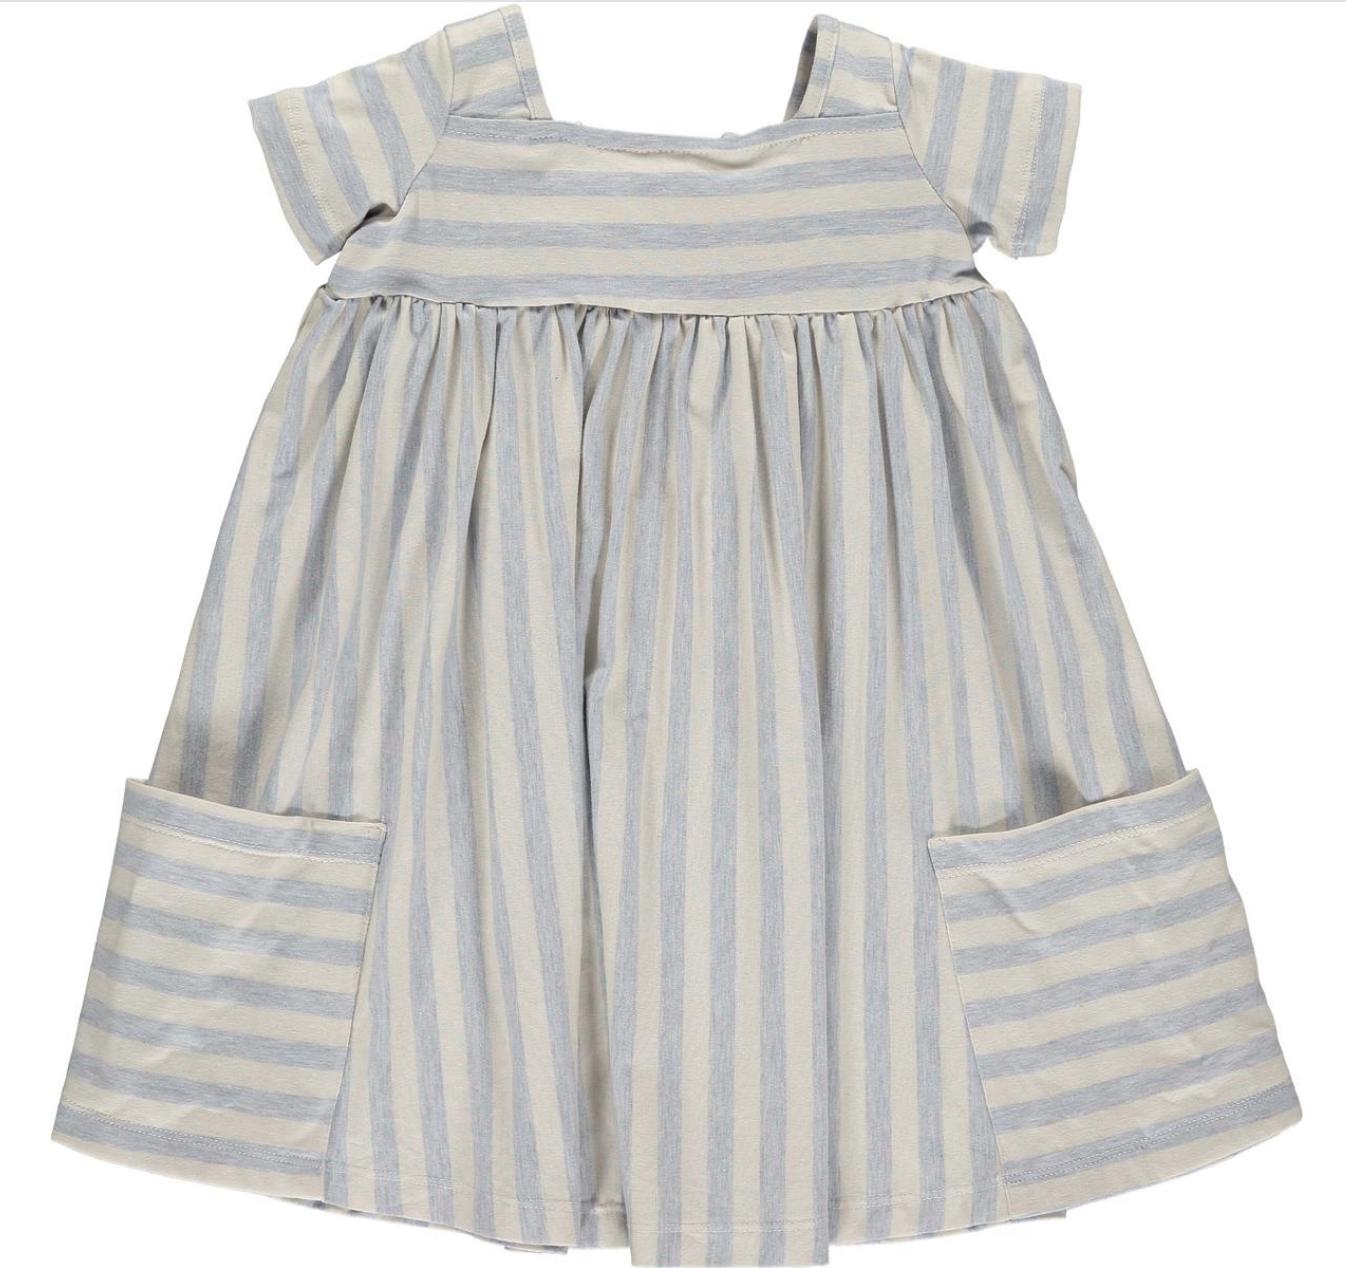 Vignette Vignette | Toddler Dress in Sky